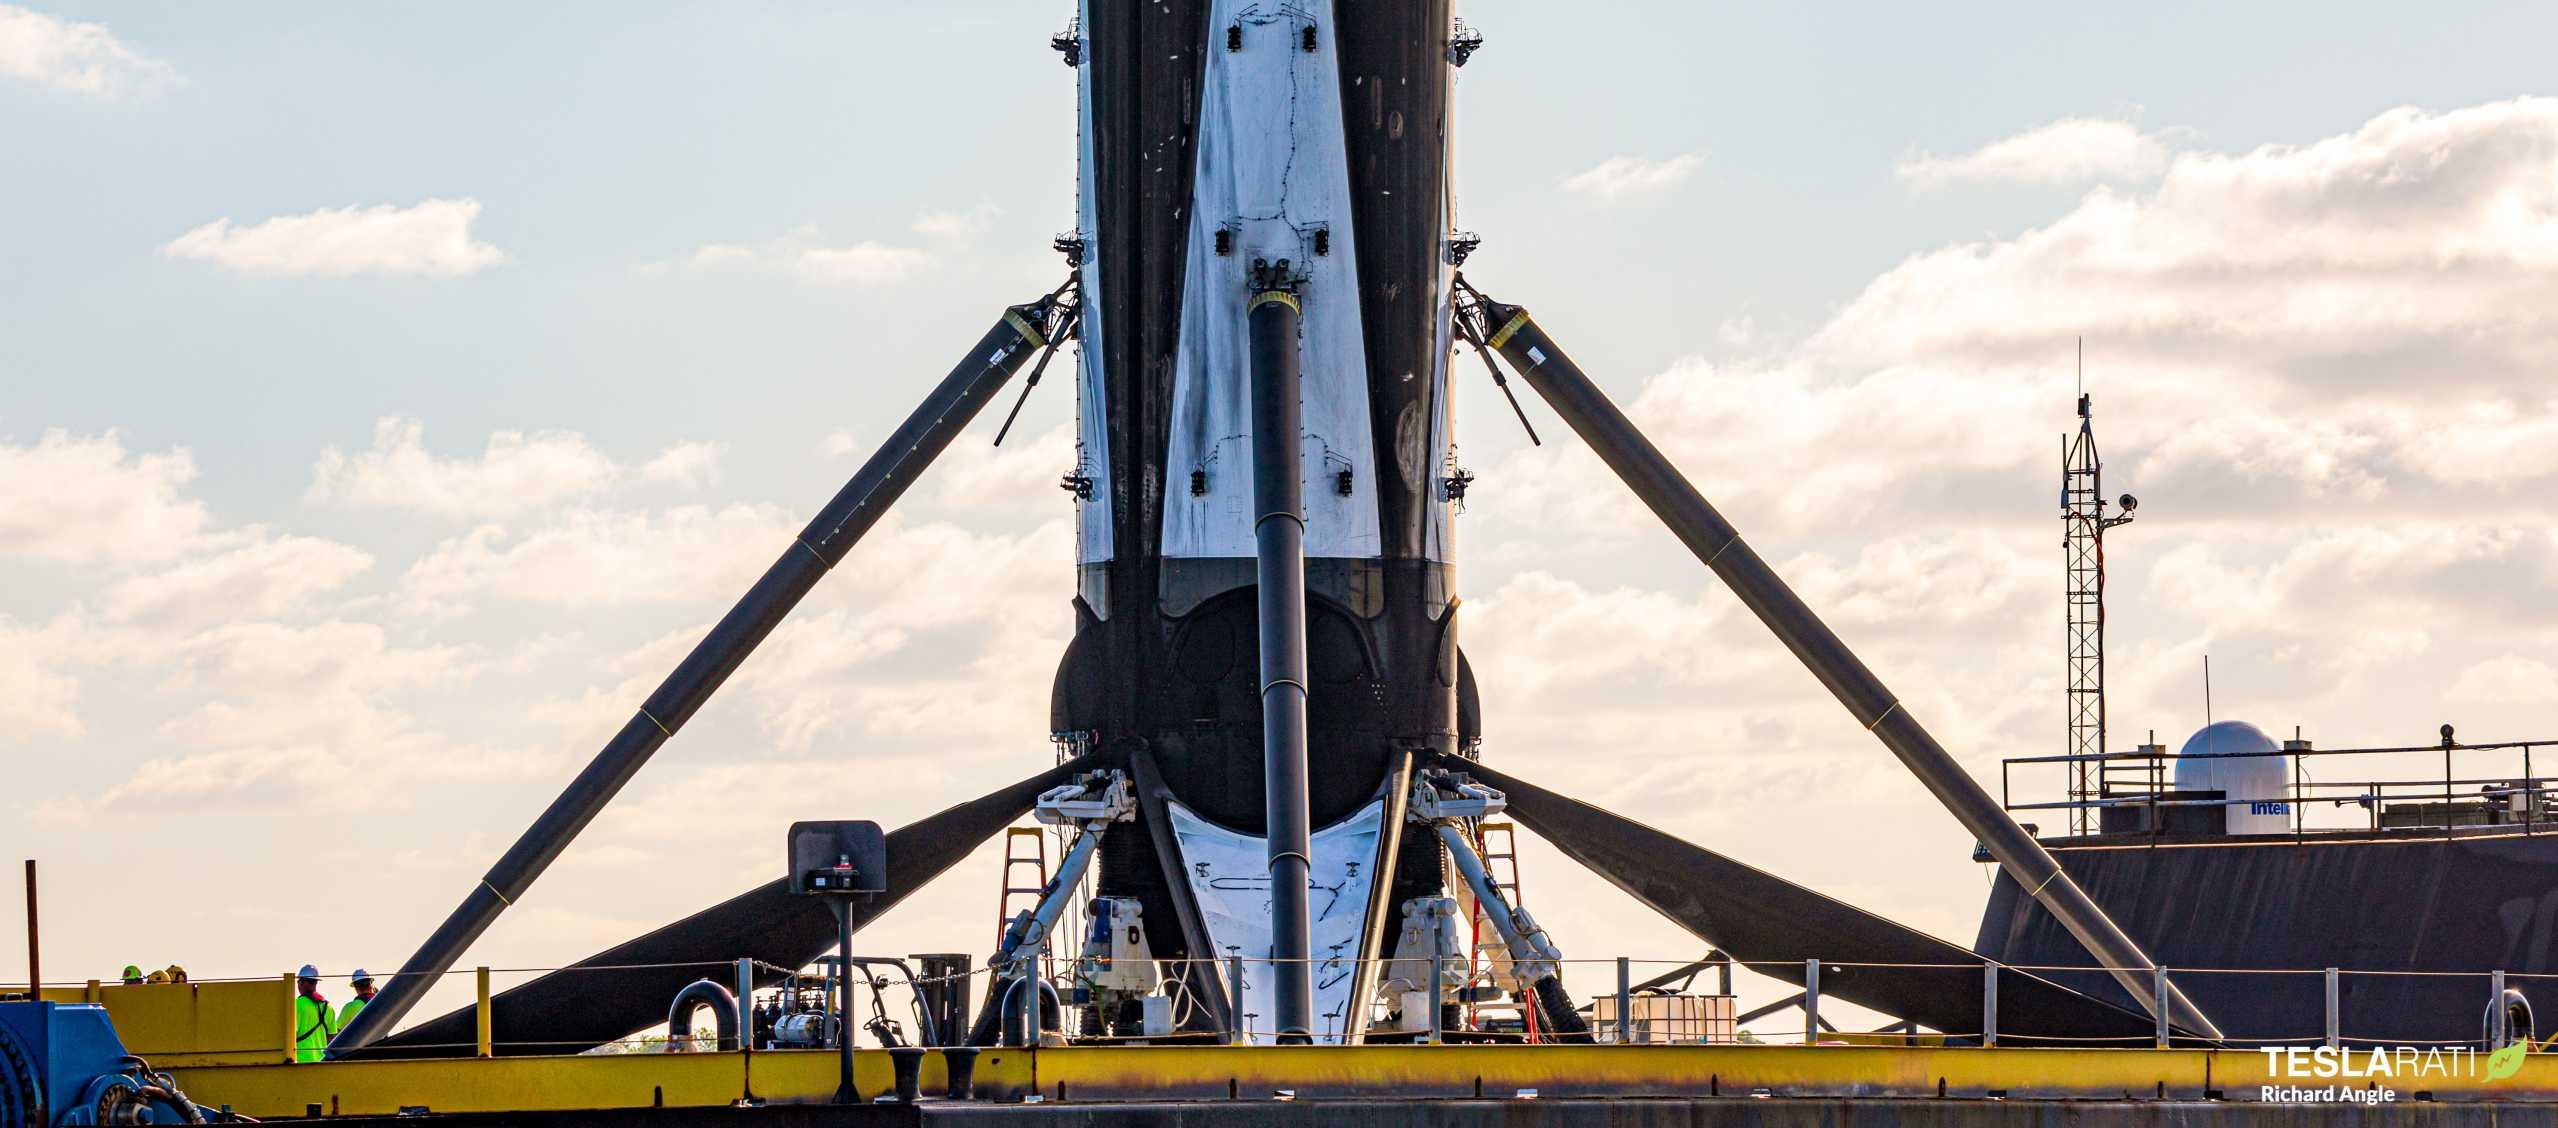 Starlink-8 Falcon 9 B1059 OCISLY return 061620 (Richard Angle) (21) crop (c)